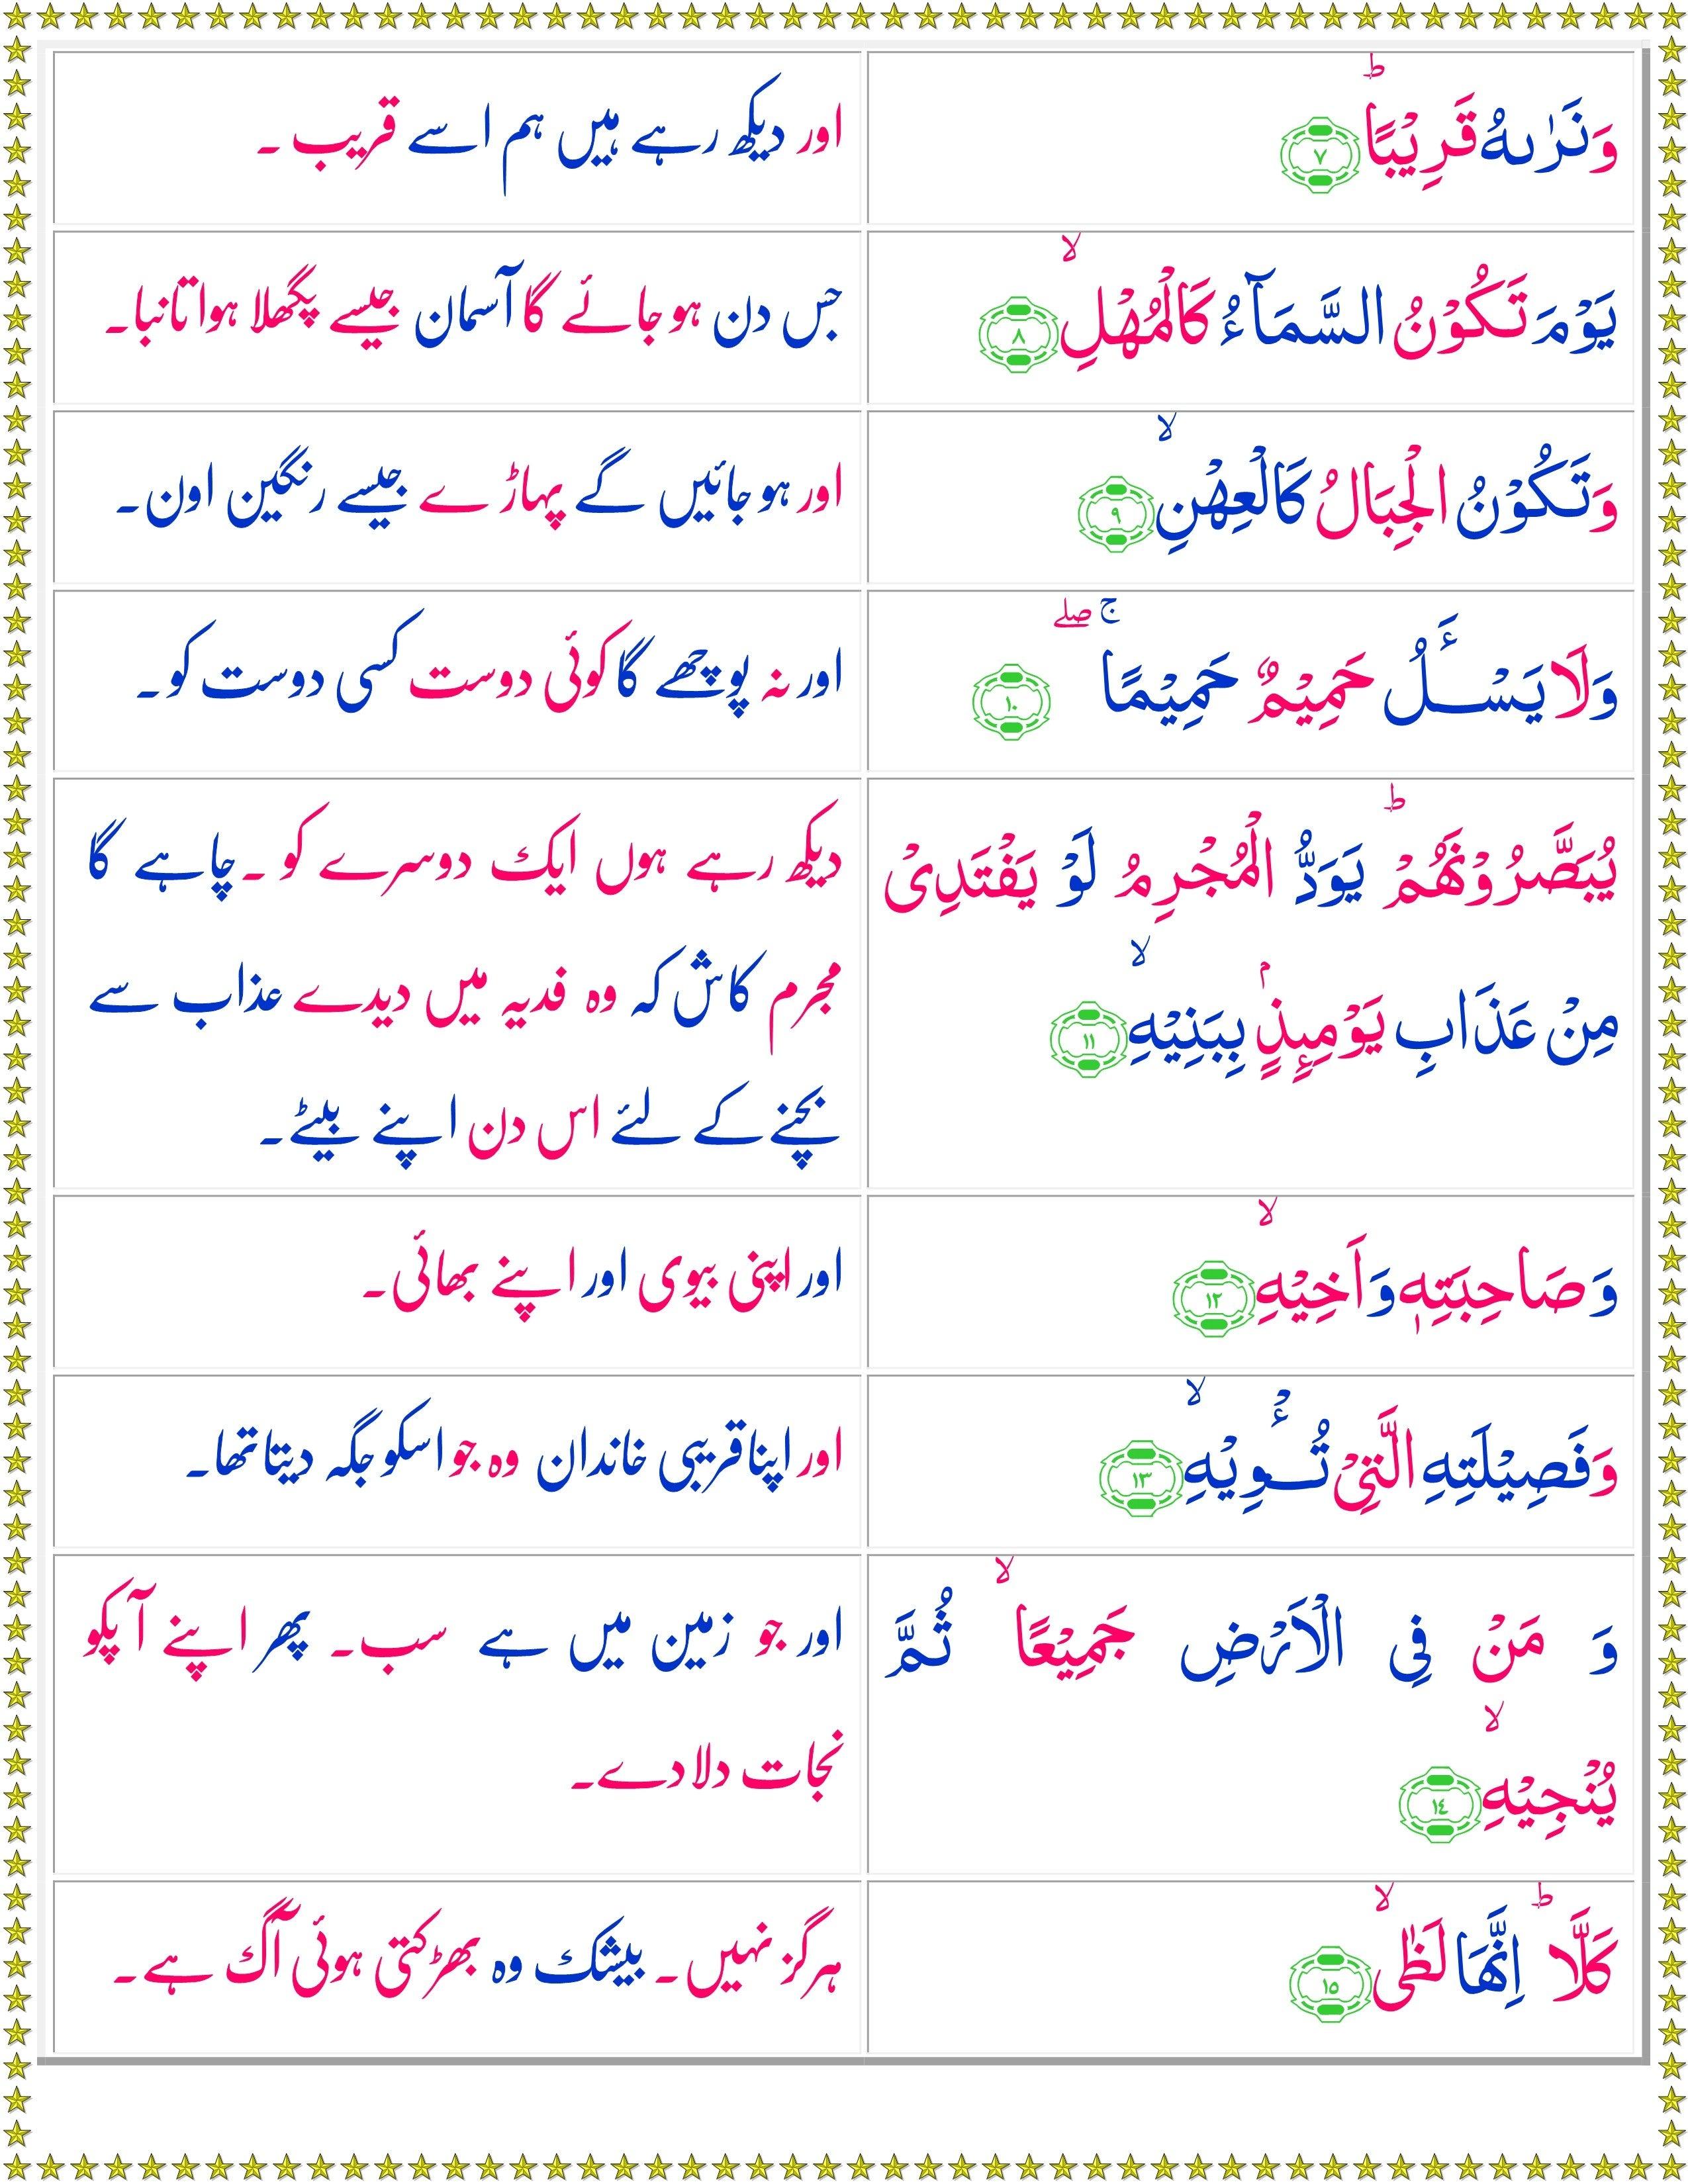 Tafseer Roohul Bayan In Epub